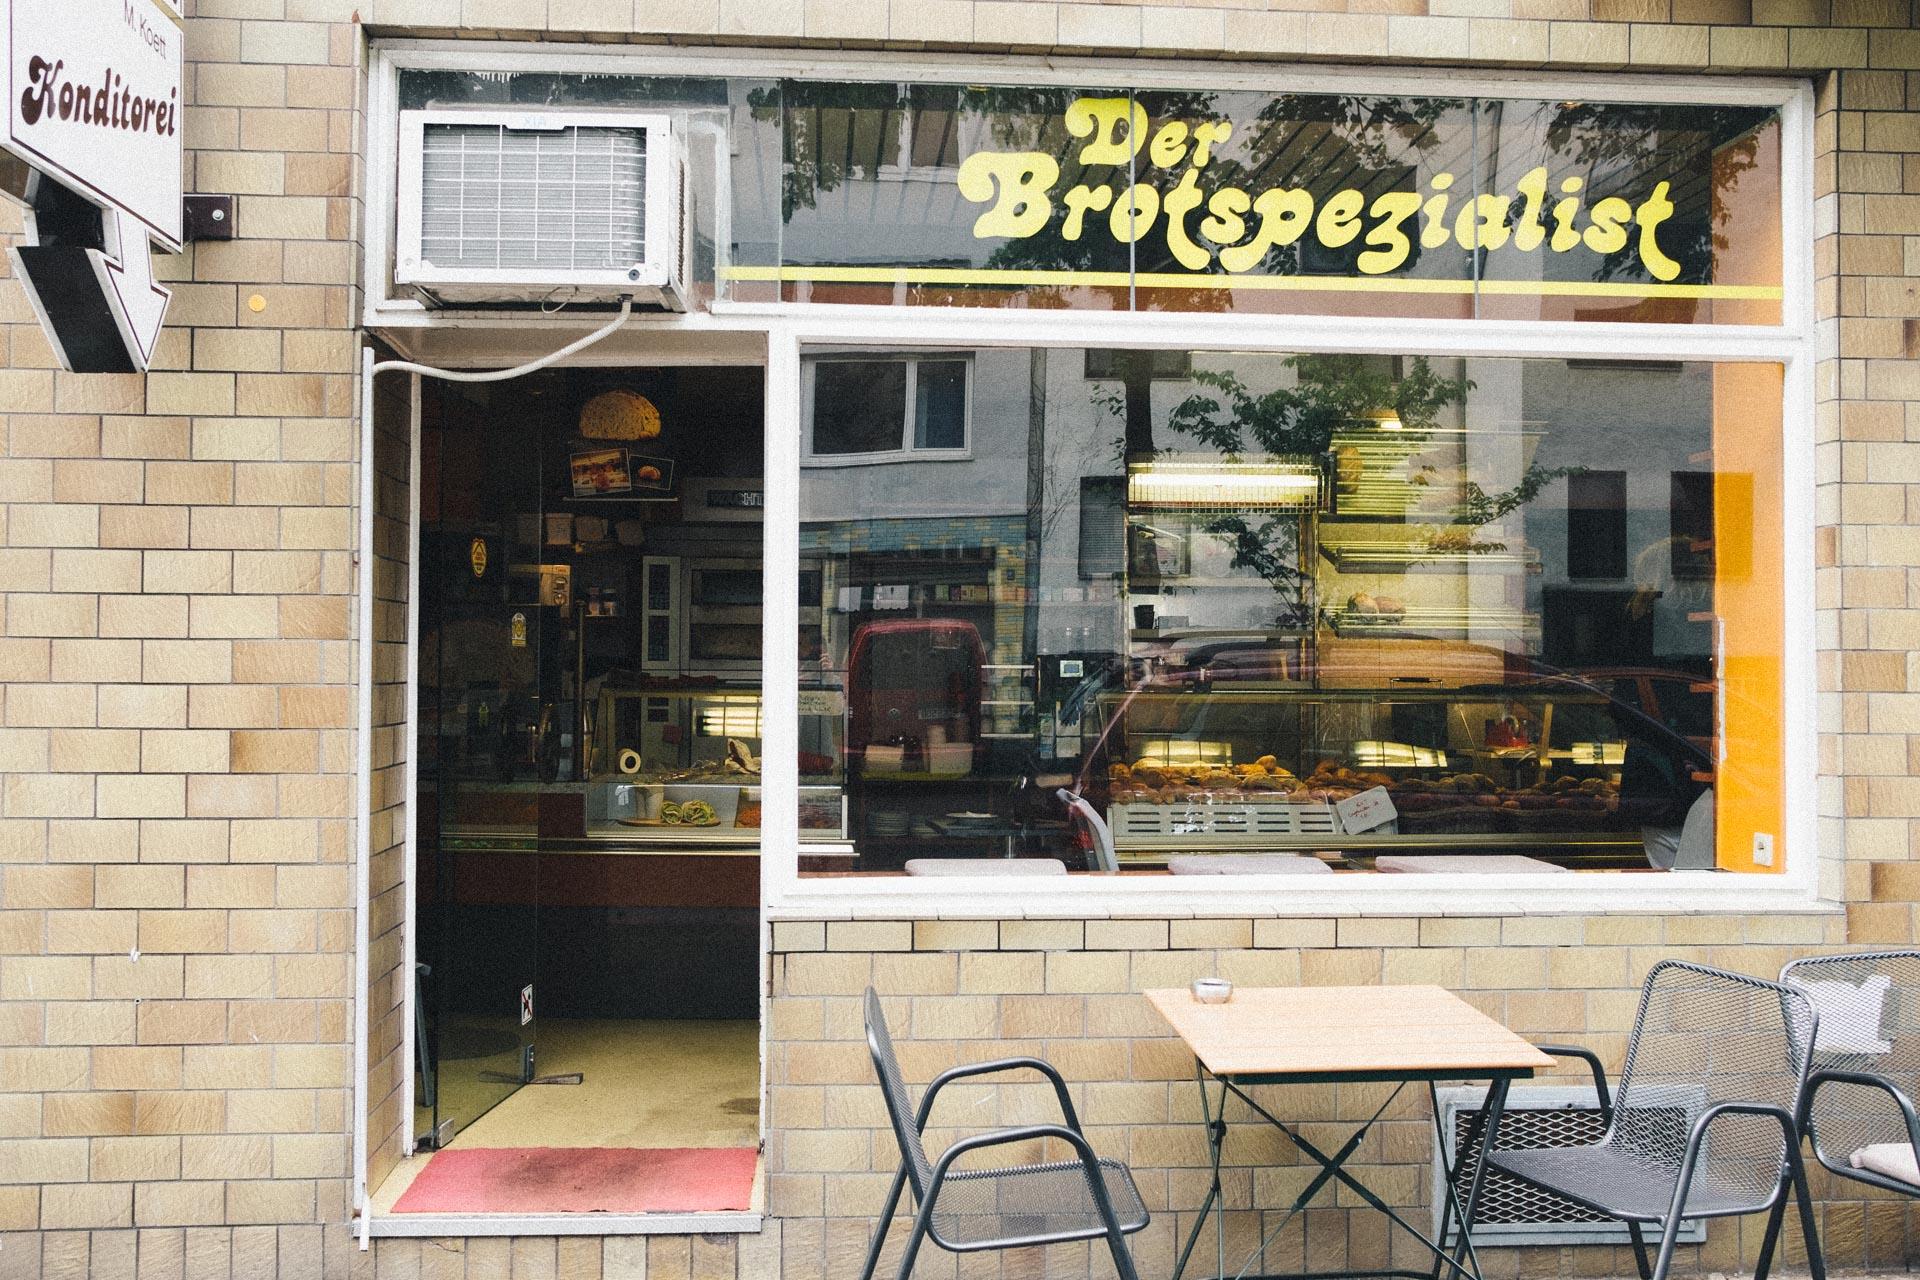 wearecity-baeckerei-derbrotspezialist-guide-koeln-atheneadiapoulis-2017-7.jpg